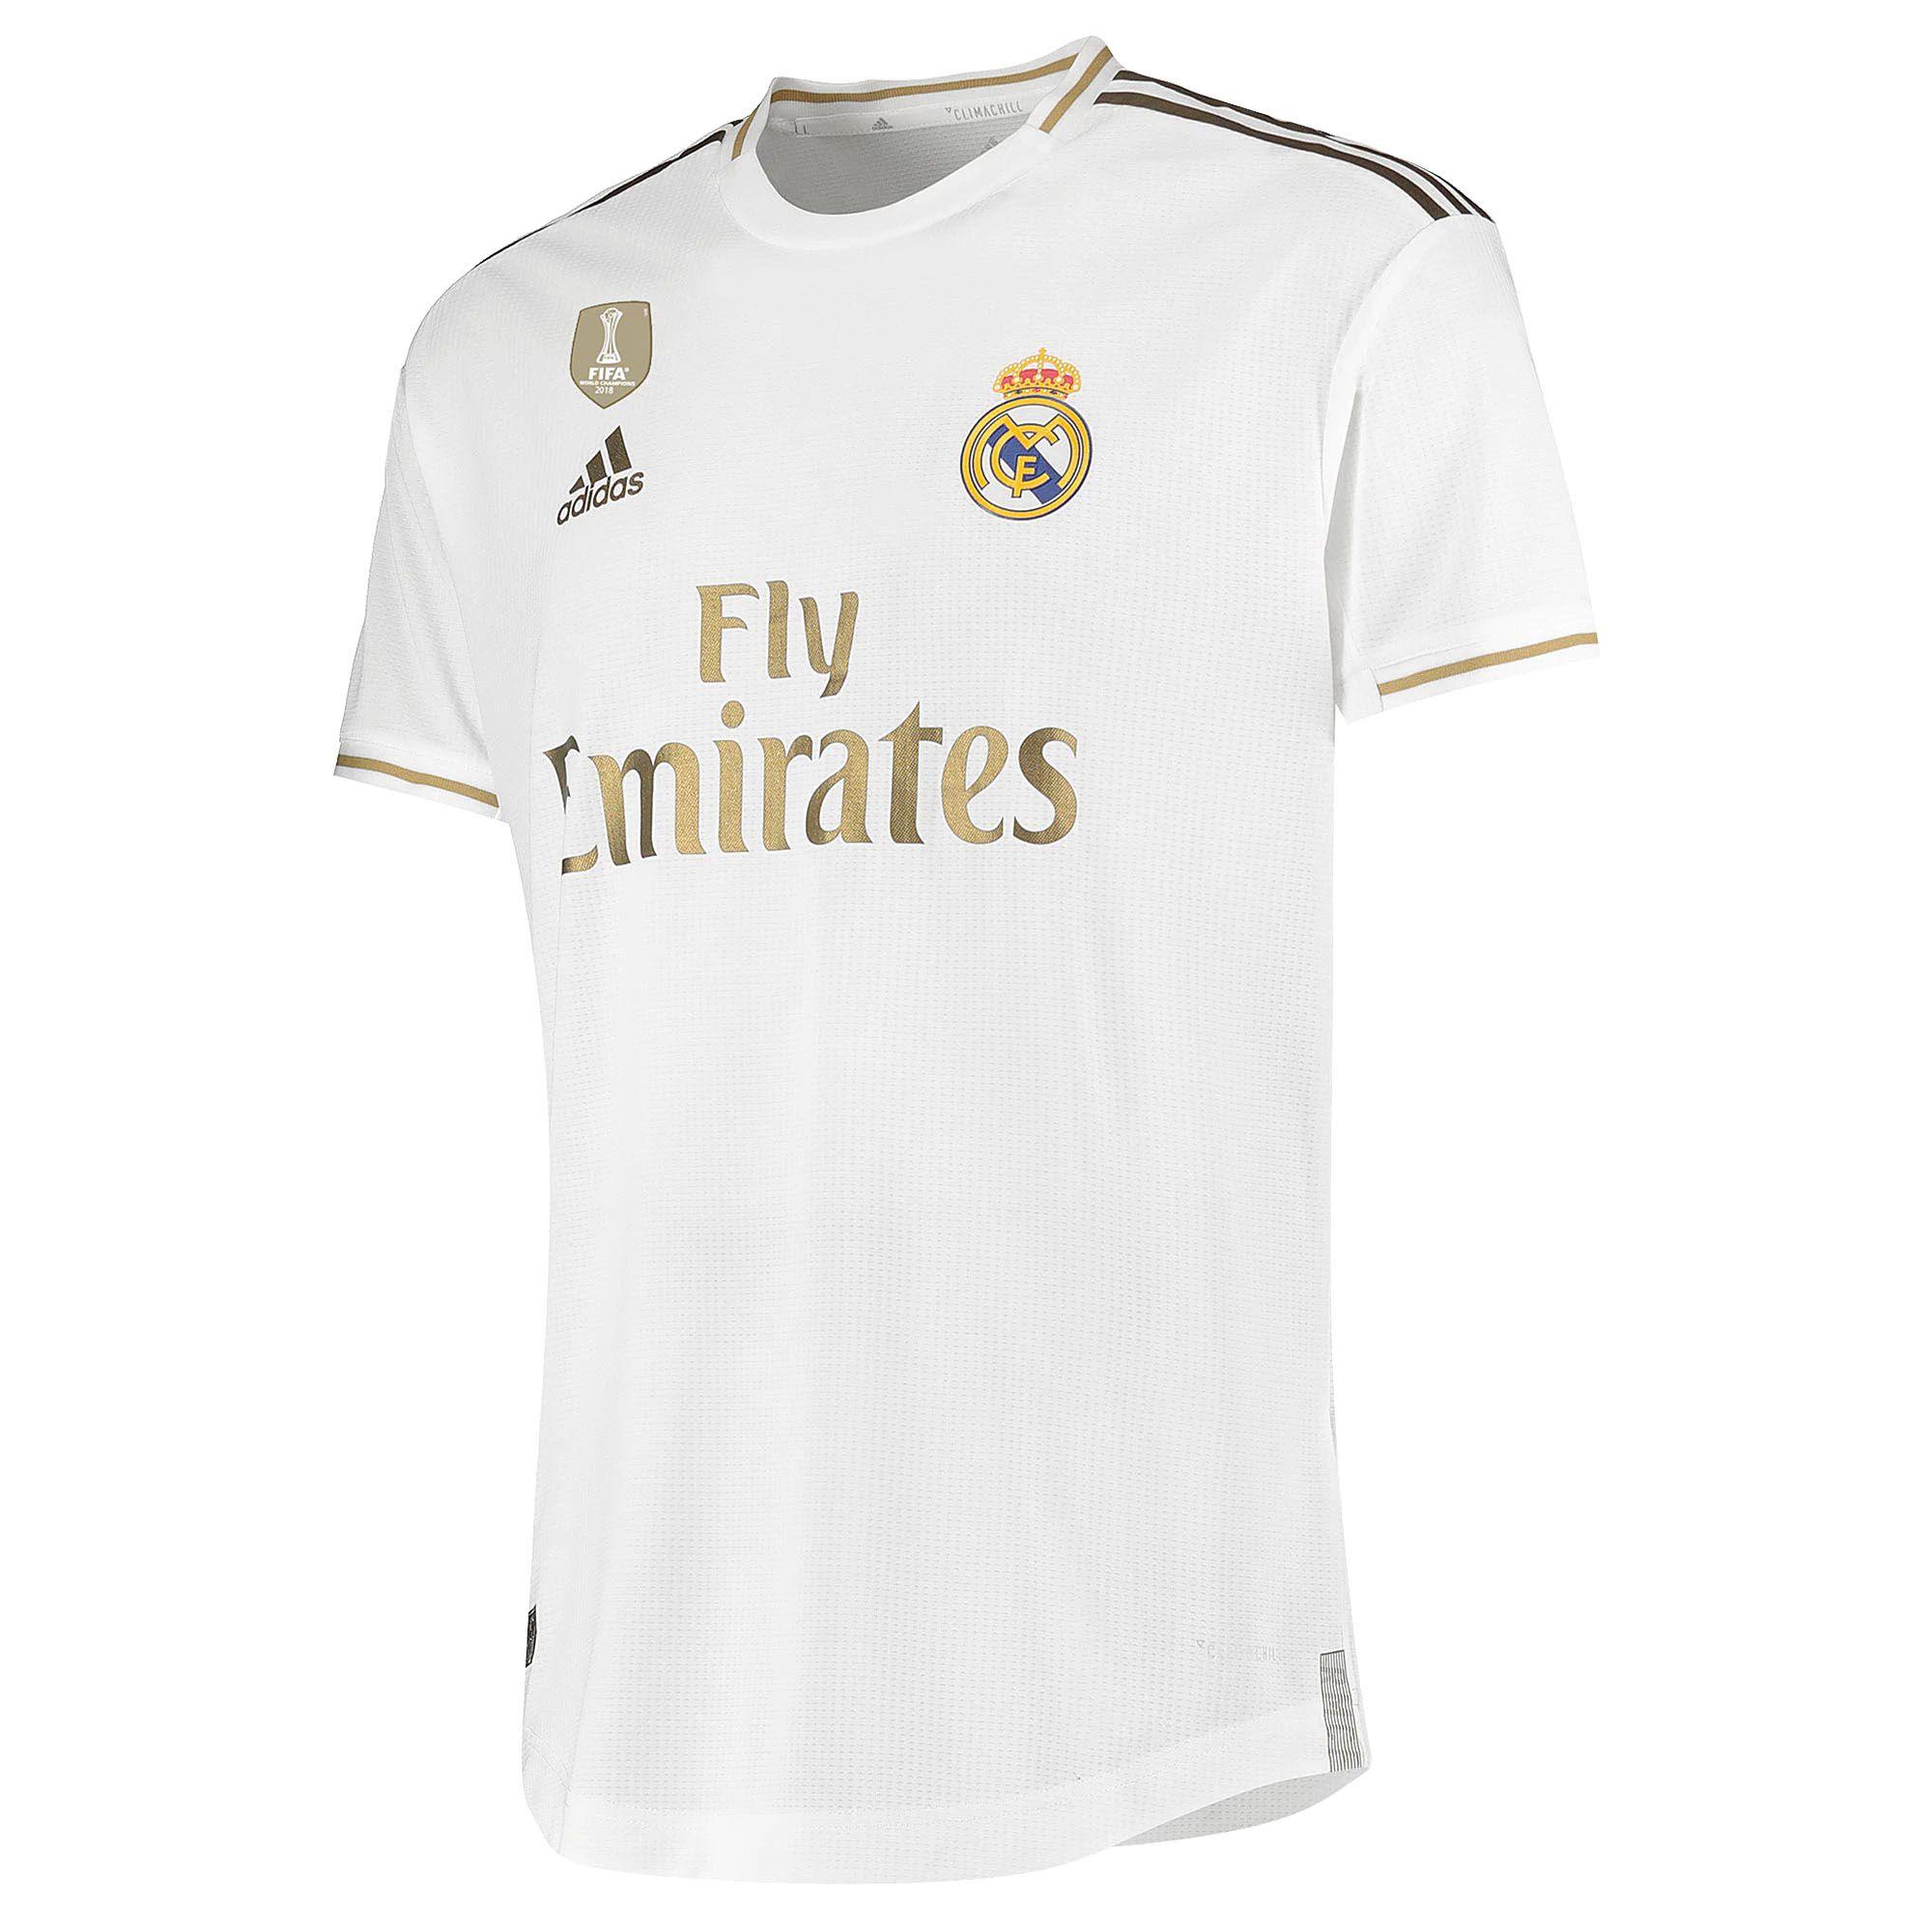 Real Madrid Home Football Kit Football Shirt 2019 20 Real Madrid Football Kits Football Shirts